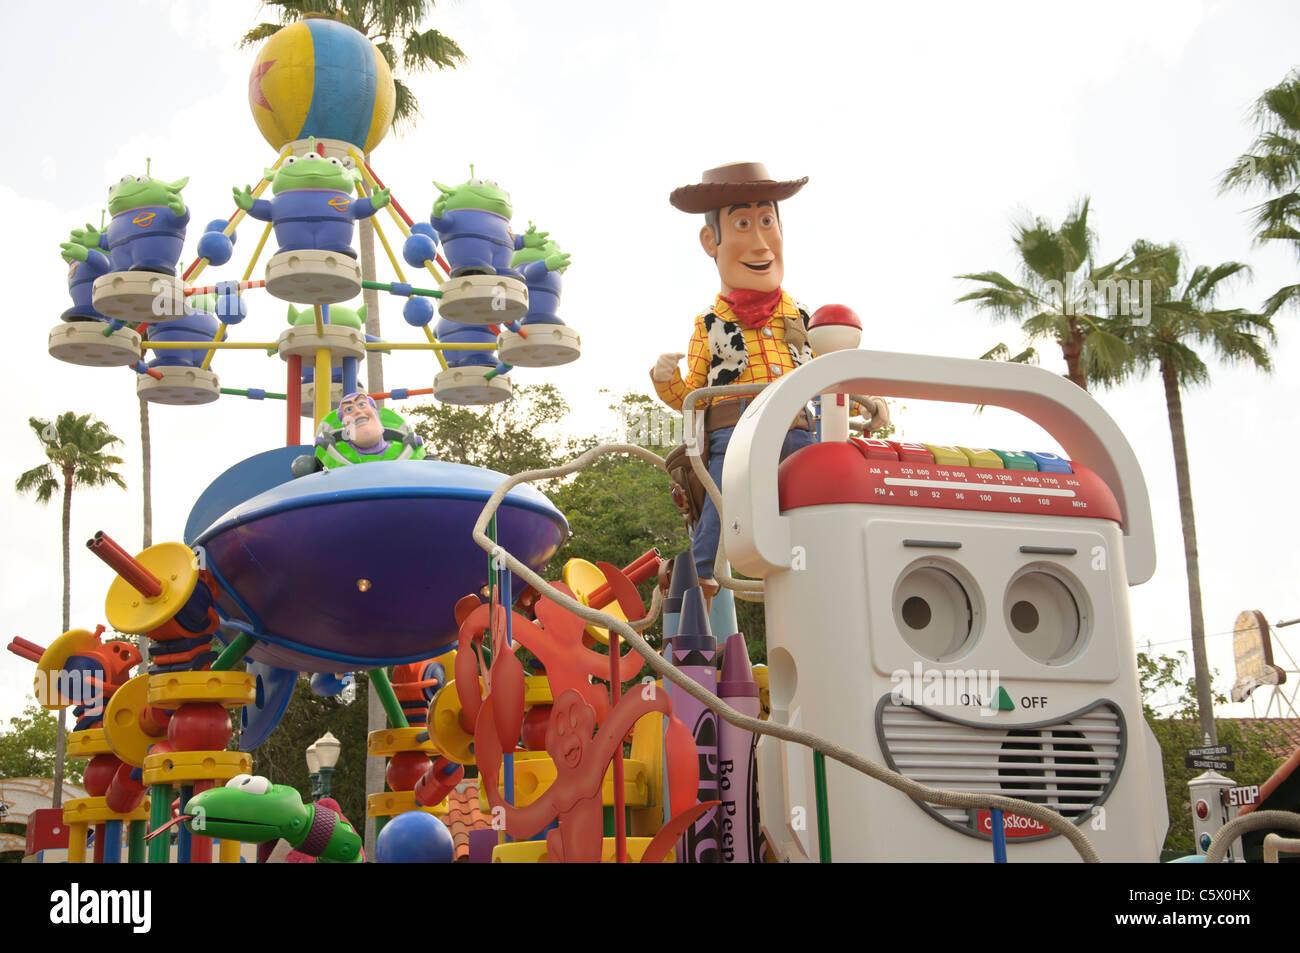 Disney Pixar Countdown To Fun Parade Walt Disney World Resort Parks